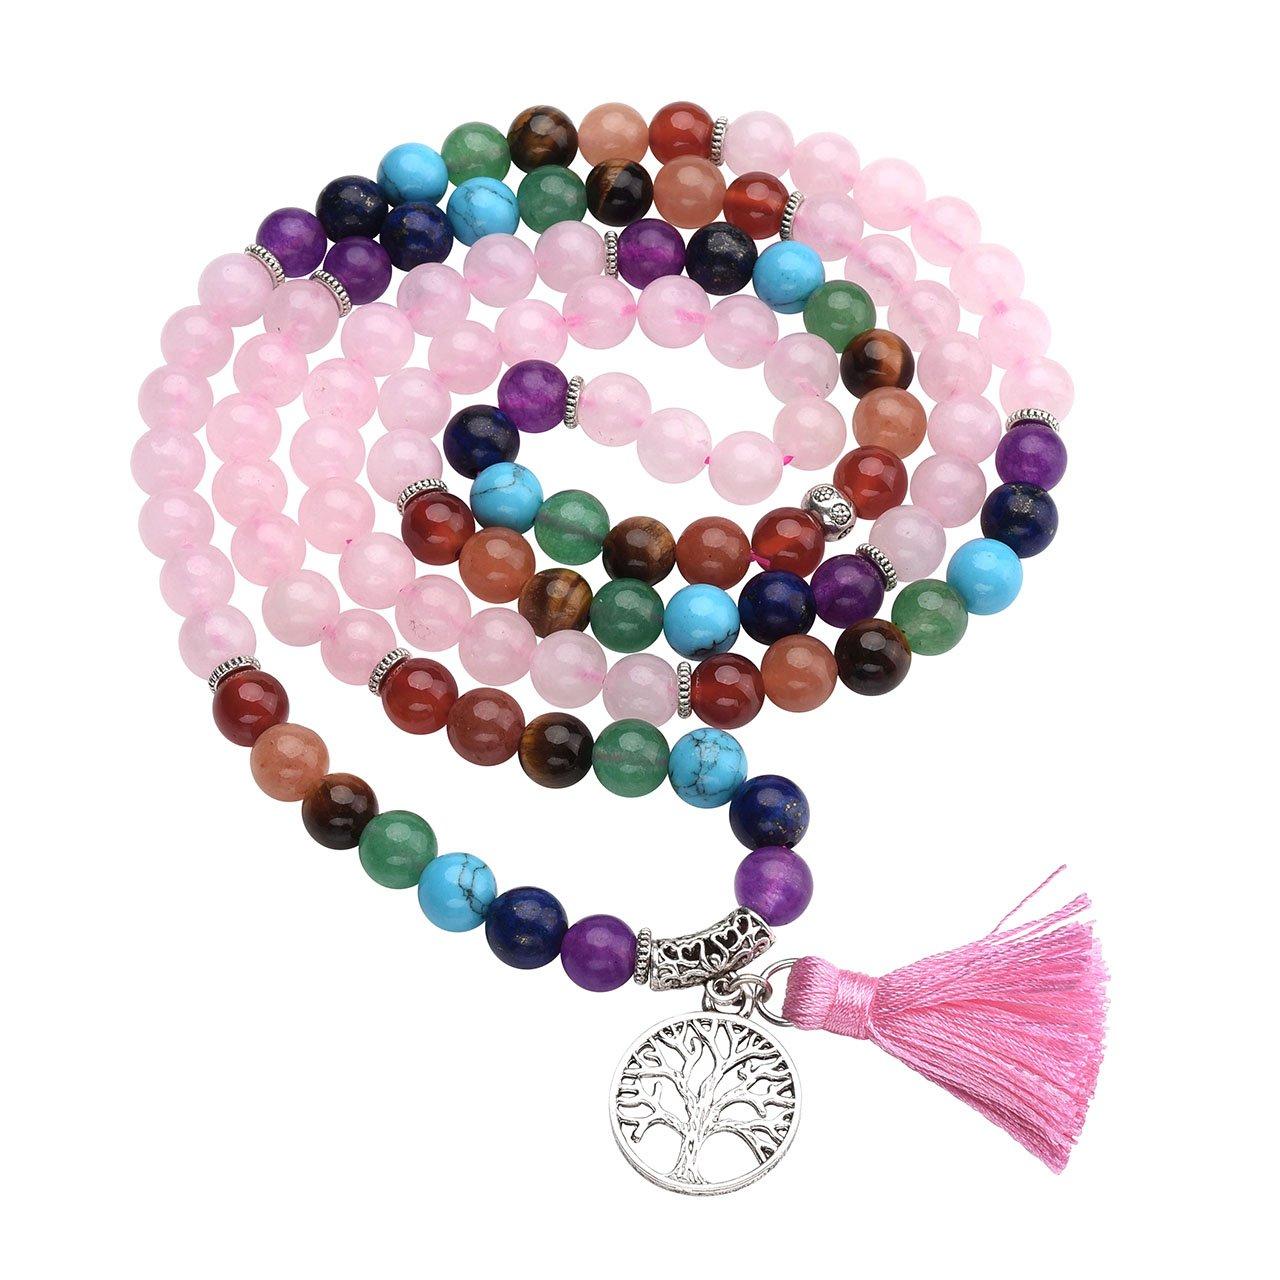 Top Plaza 7 Chakra Buddhist Mala Prayer Beads 108 Meditation Healing Multilayer Bracelet/Necklace W/Tree of Life Tassel Charm, Rose Quartz